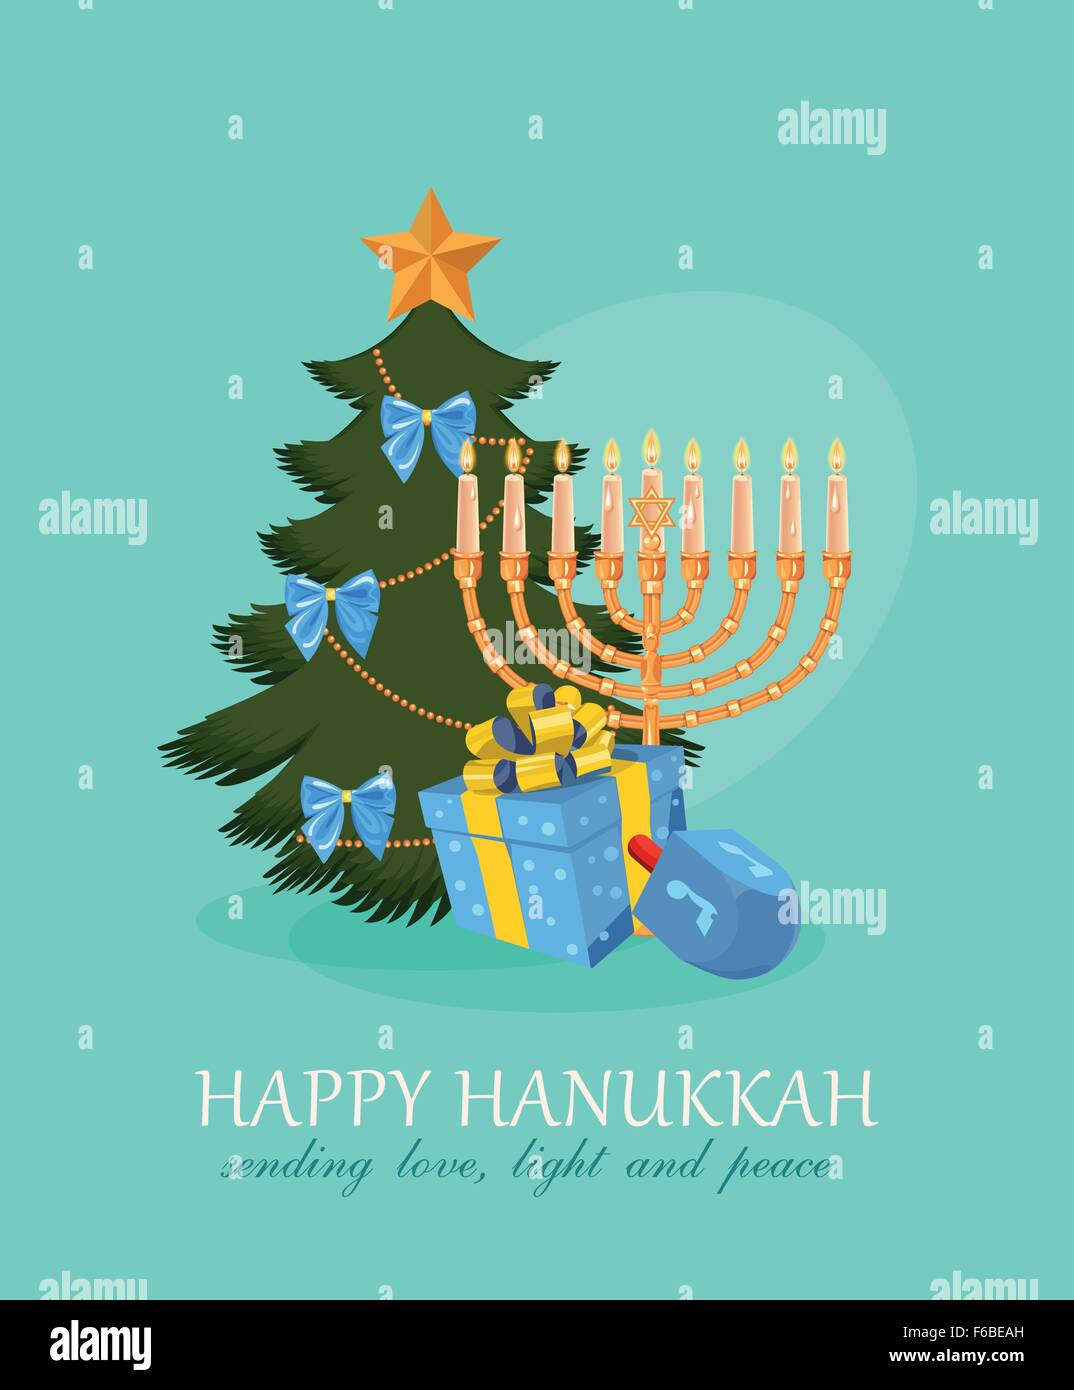 Happy hanukkah greeting card design jewish holiday vector stock happy hanukkah greeting card design jewish holiday vector illustration m4hsunfo